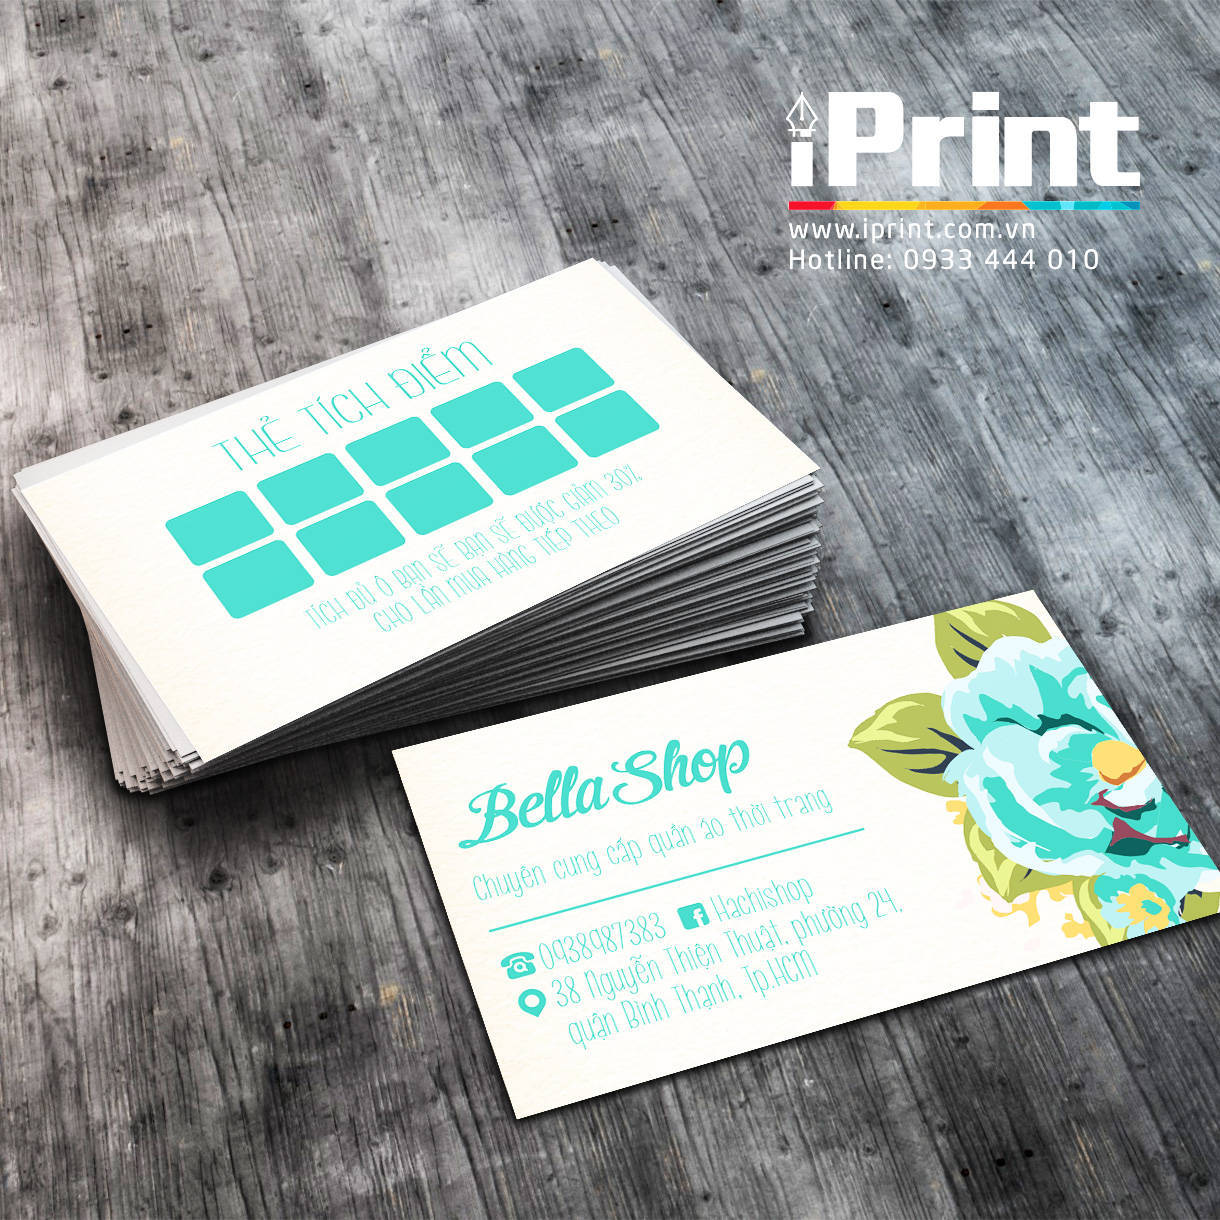 Name Card Shop Quần Áo 28